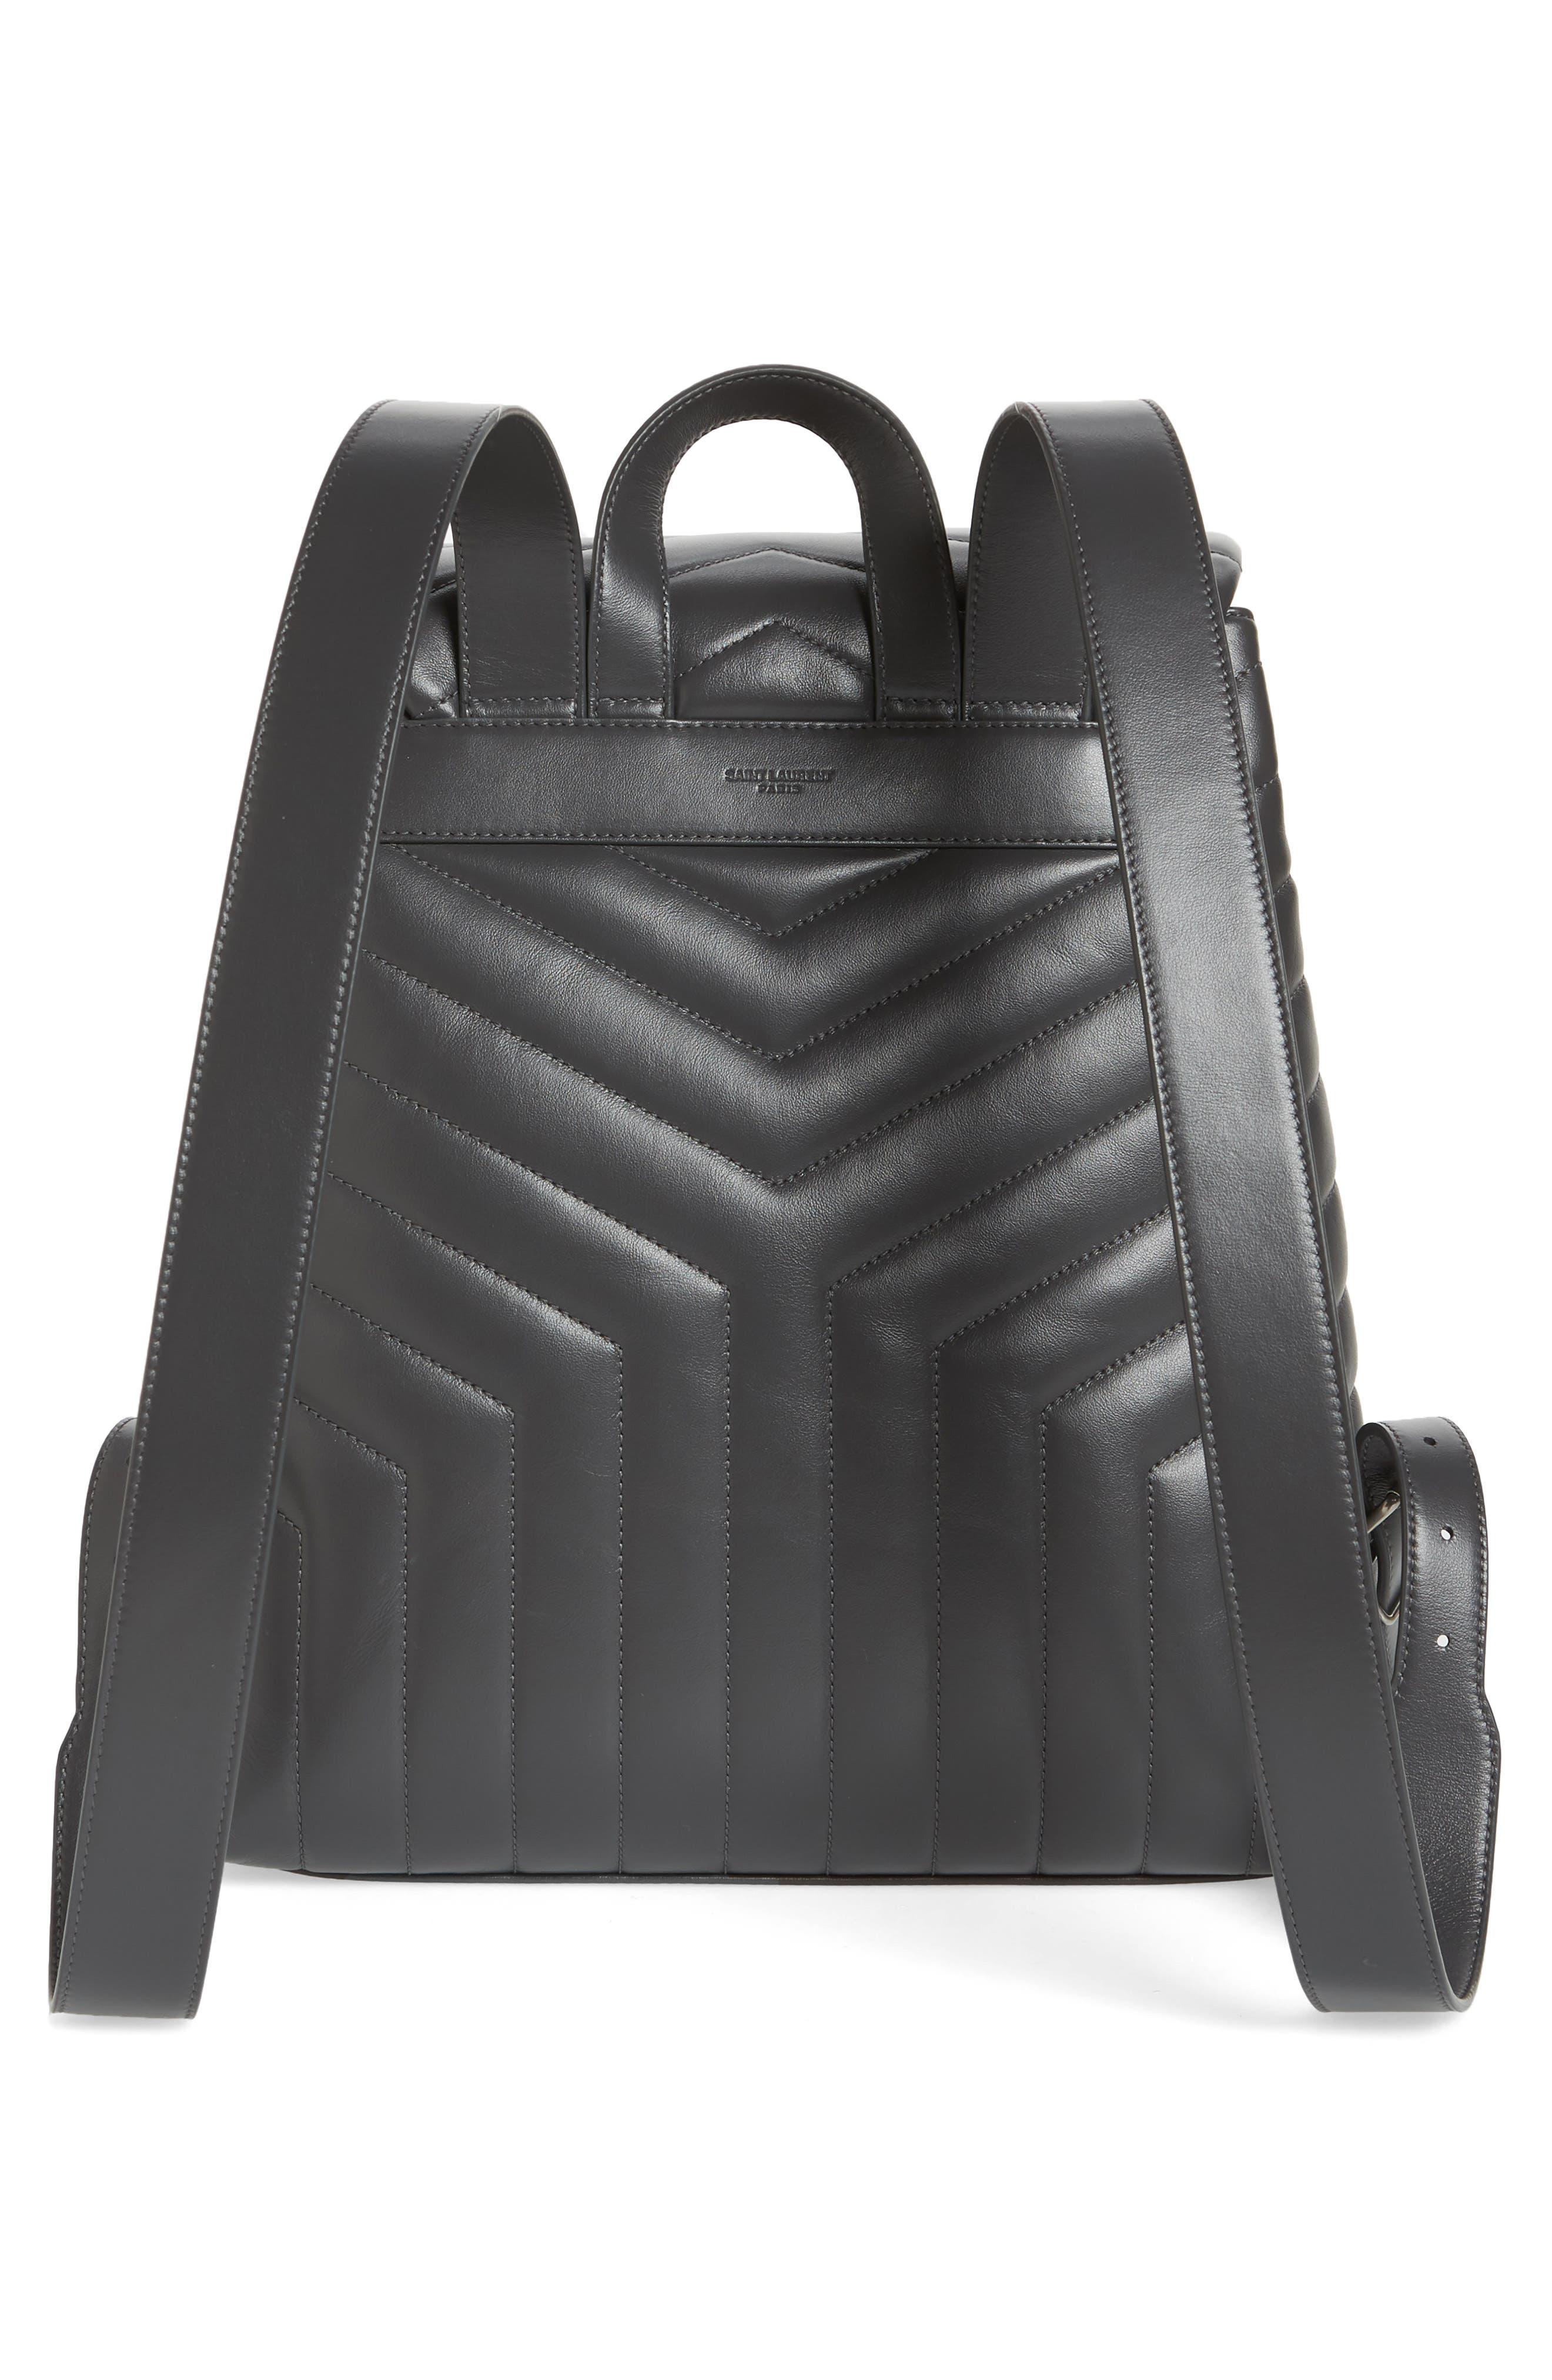 Medium Loulou Calfskin Leather Backpack,                             Alternate thumbnail 3, color,                             021